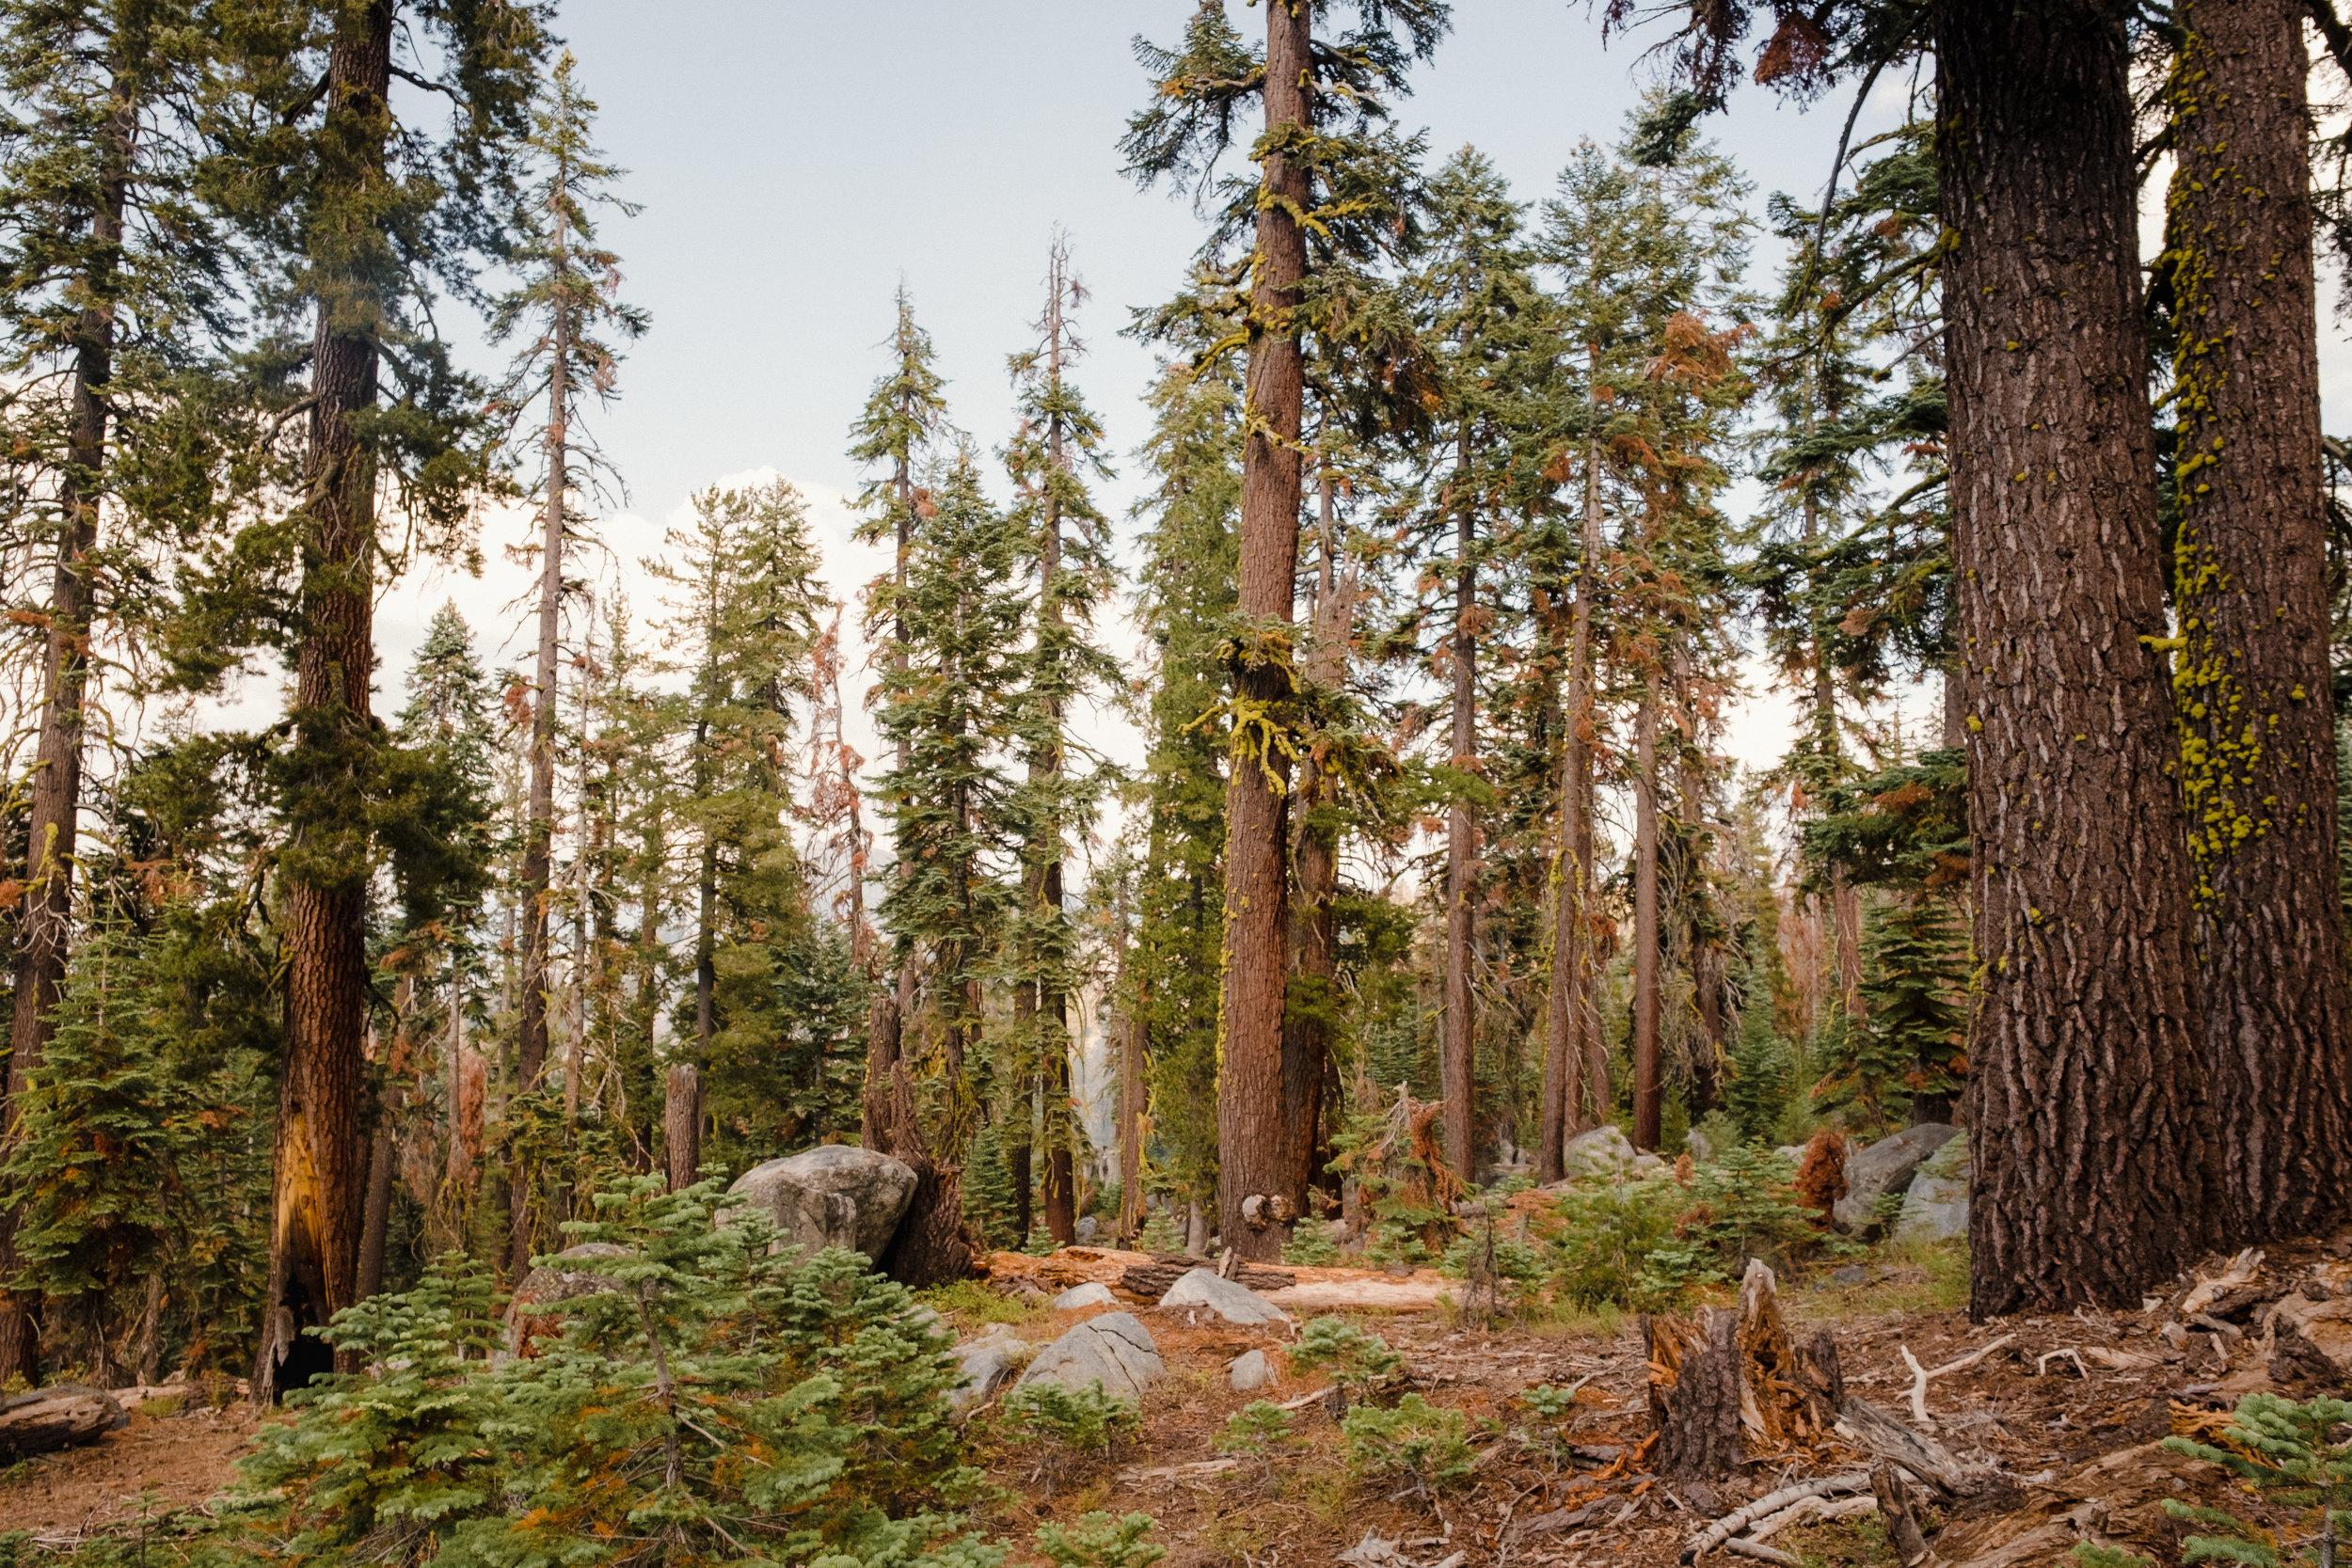 Yosemite_National_Park4.jpg